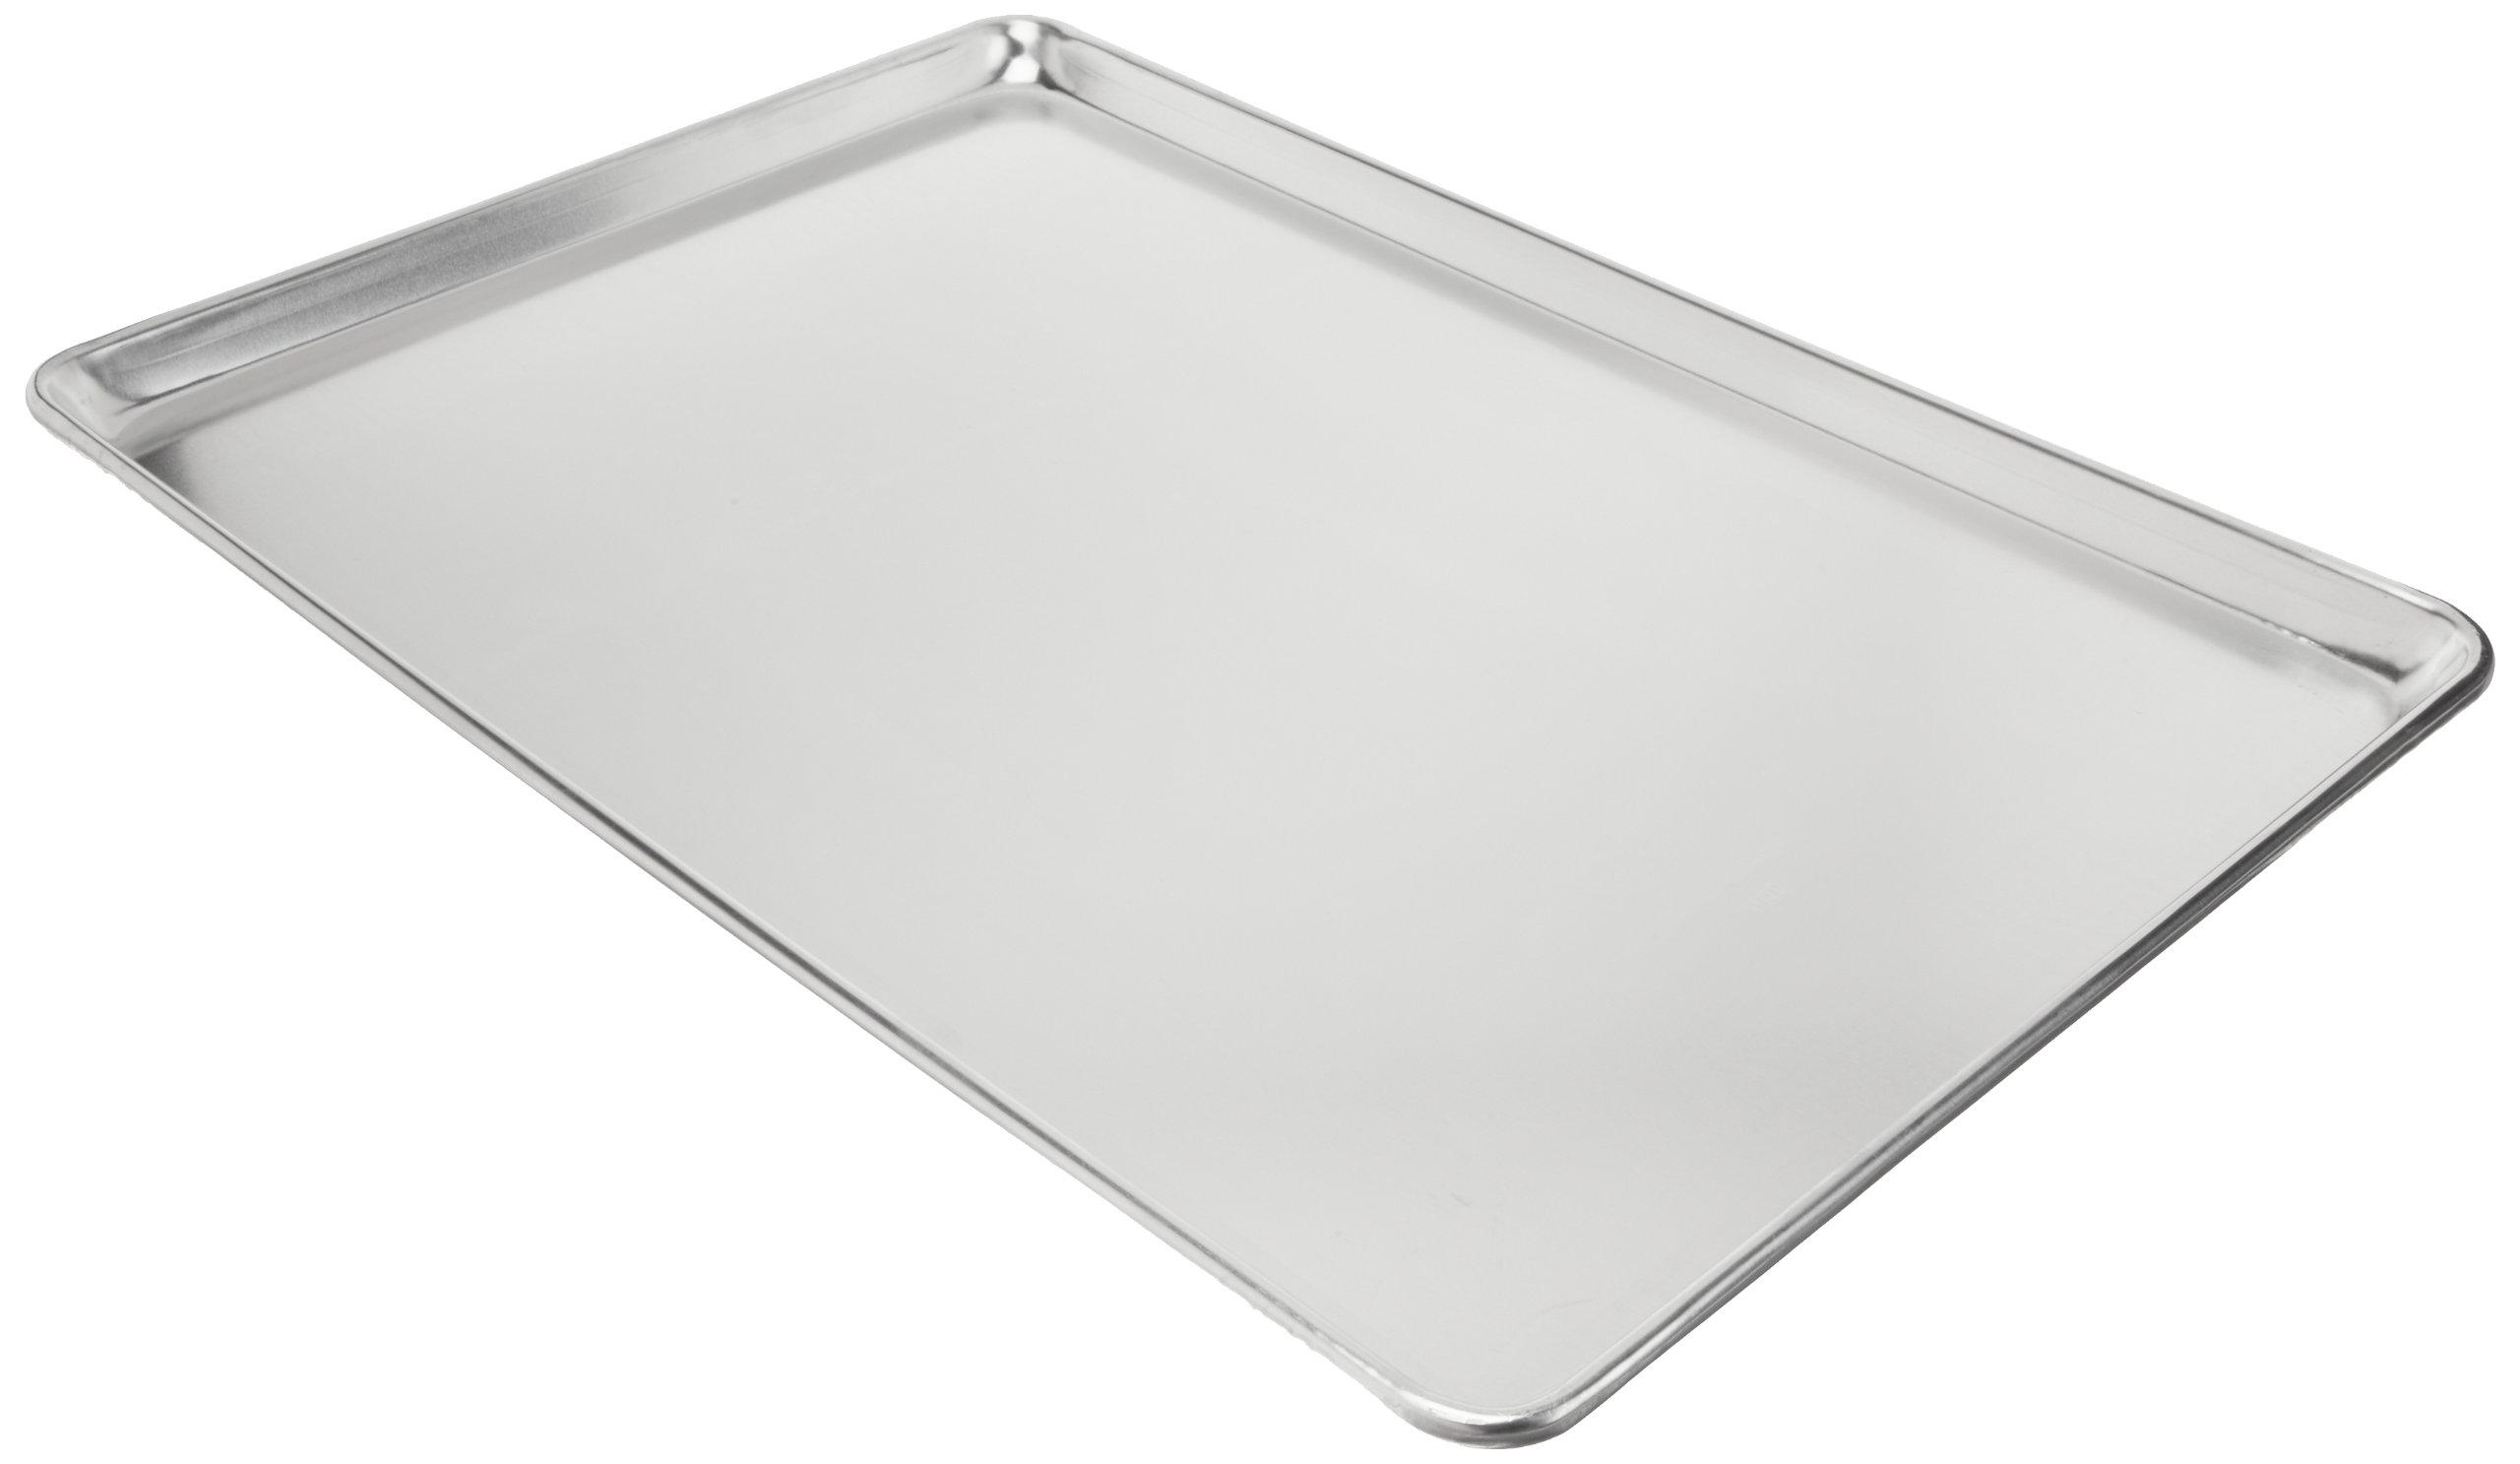 Stanton Trading Full Size Aluminum Sheet Pan - BunPan, 18 by 26-Inch (1 Each)